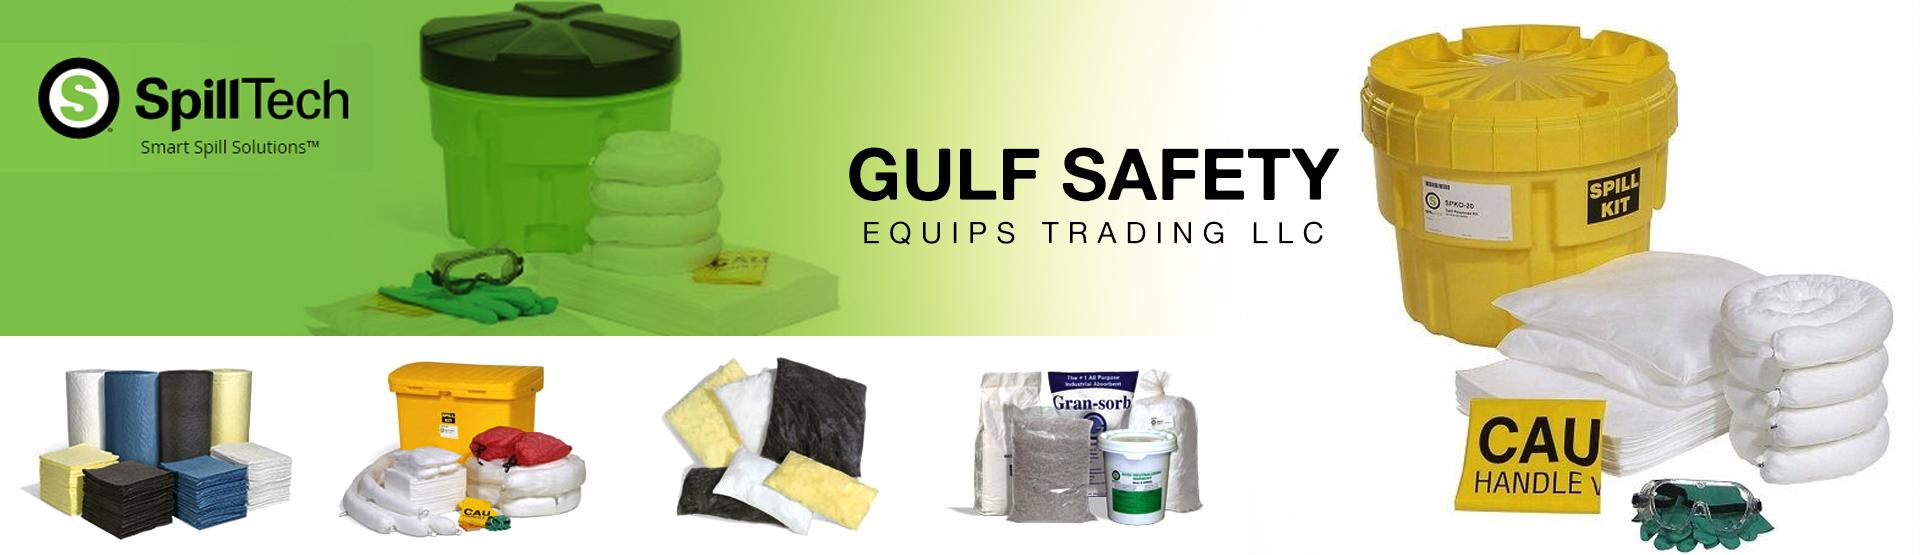 GULF SAFETY EQUIPS TRADING LLC